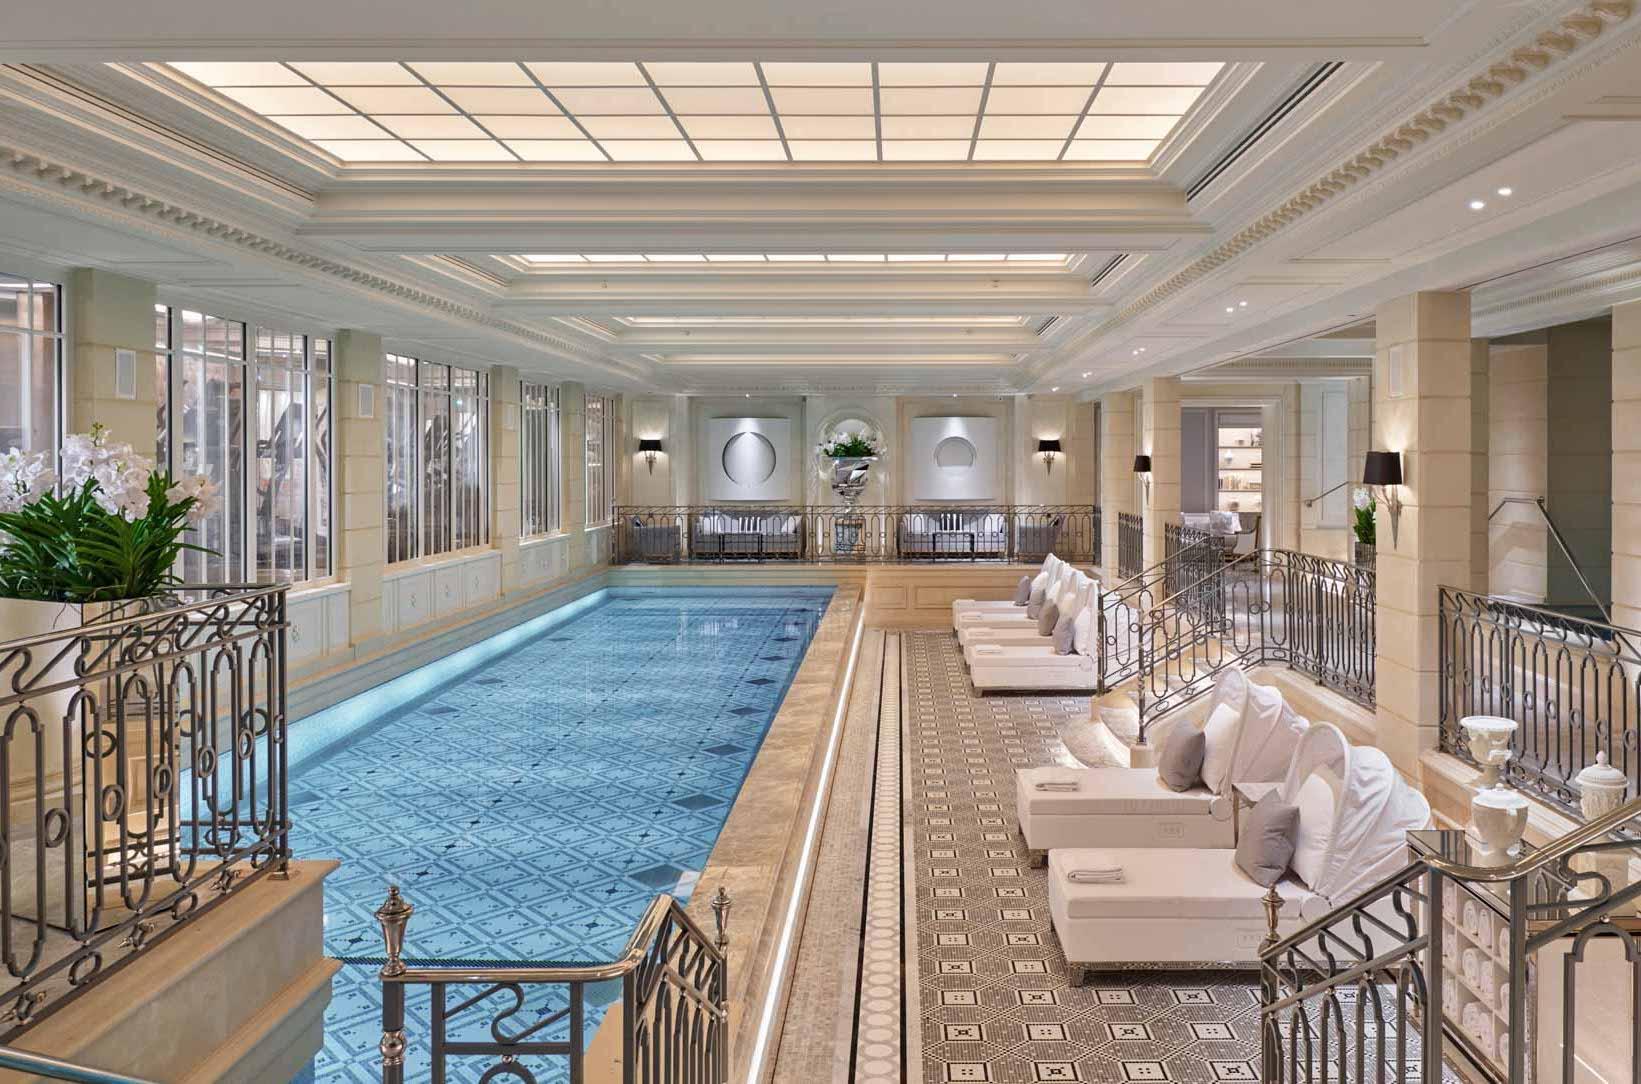 L'immense piscine du Four Seasons © Four Seasons Hotels and Resorts